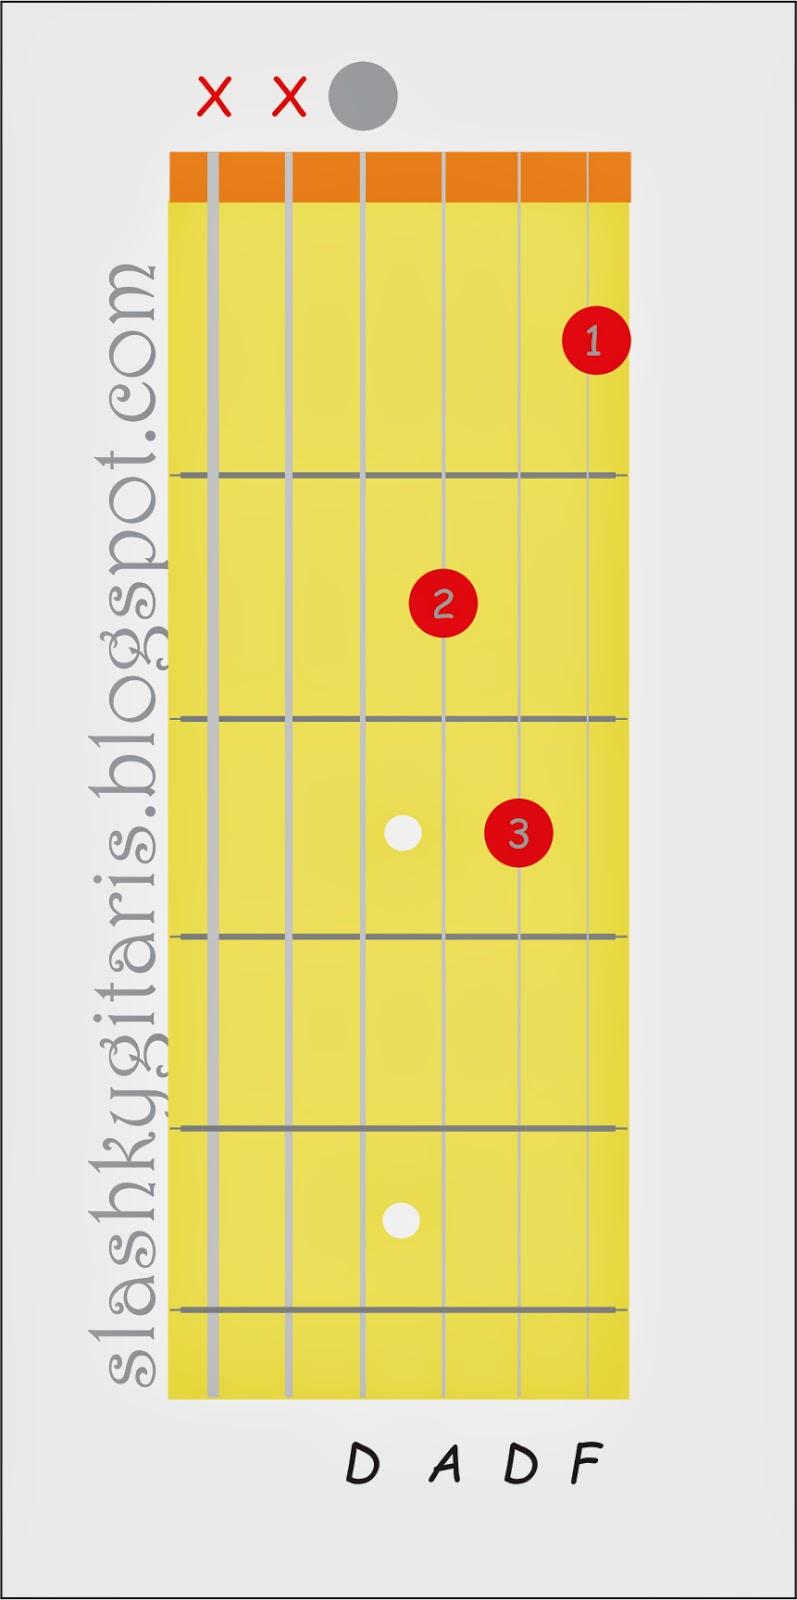 belajar chord gitar, belajar gitar, belajar gitar pemula, belajar kunci gitar, kunci D mayor, kunci gitar, Kunci D minor,